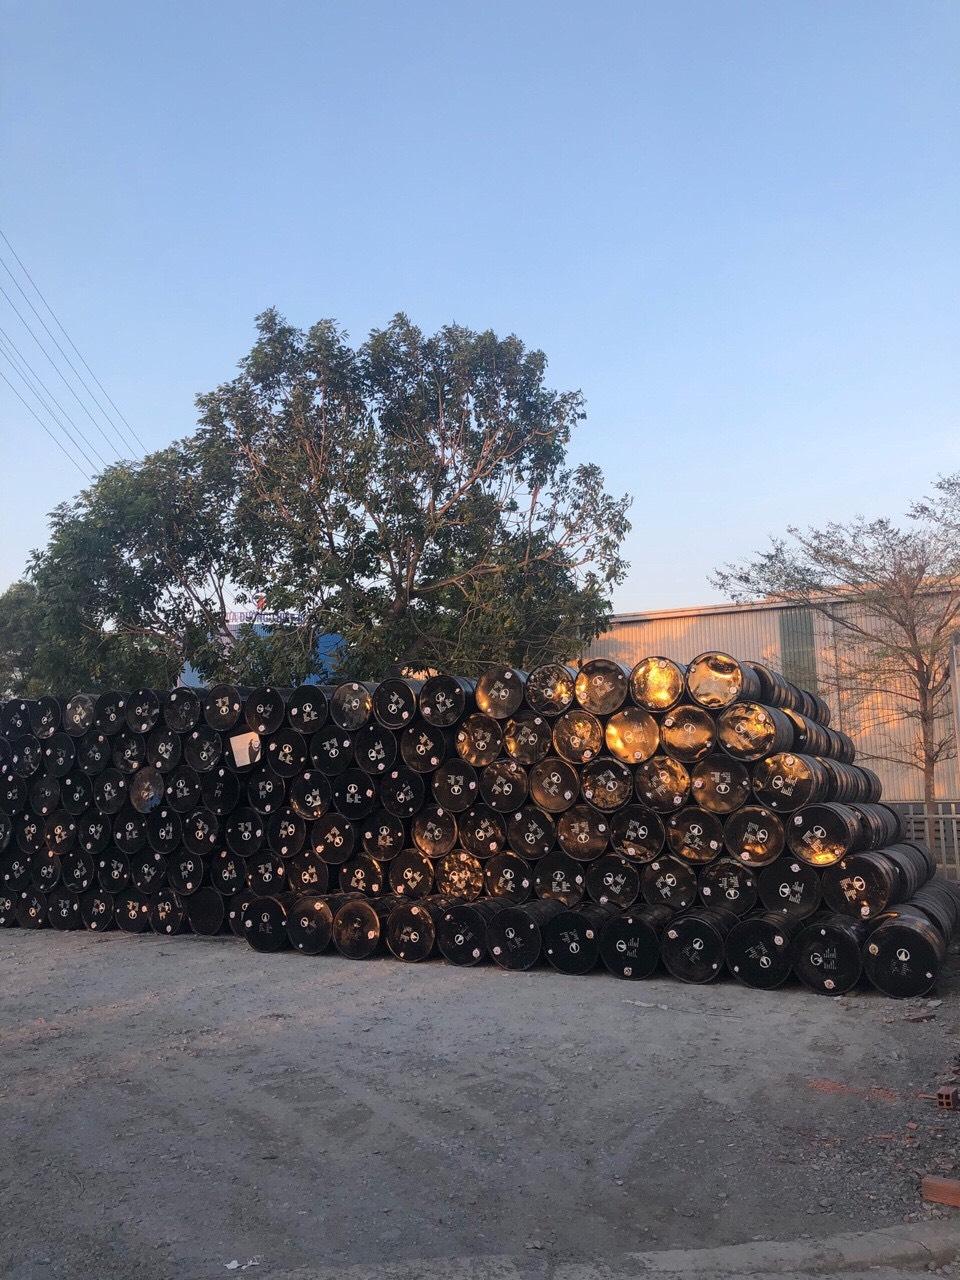 http://nhuaduong.net.vn/images/trangchu//f56d6f81ed3a17644e2b.jpg